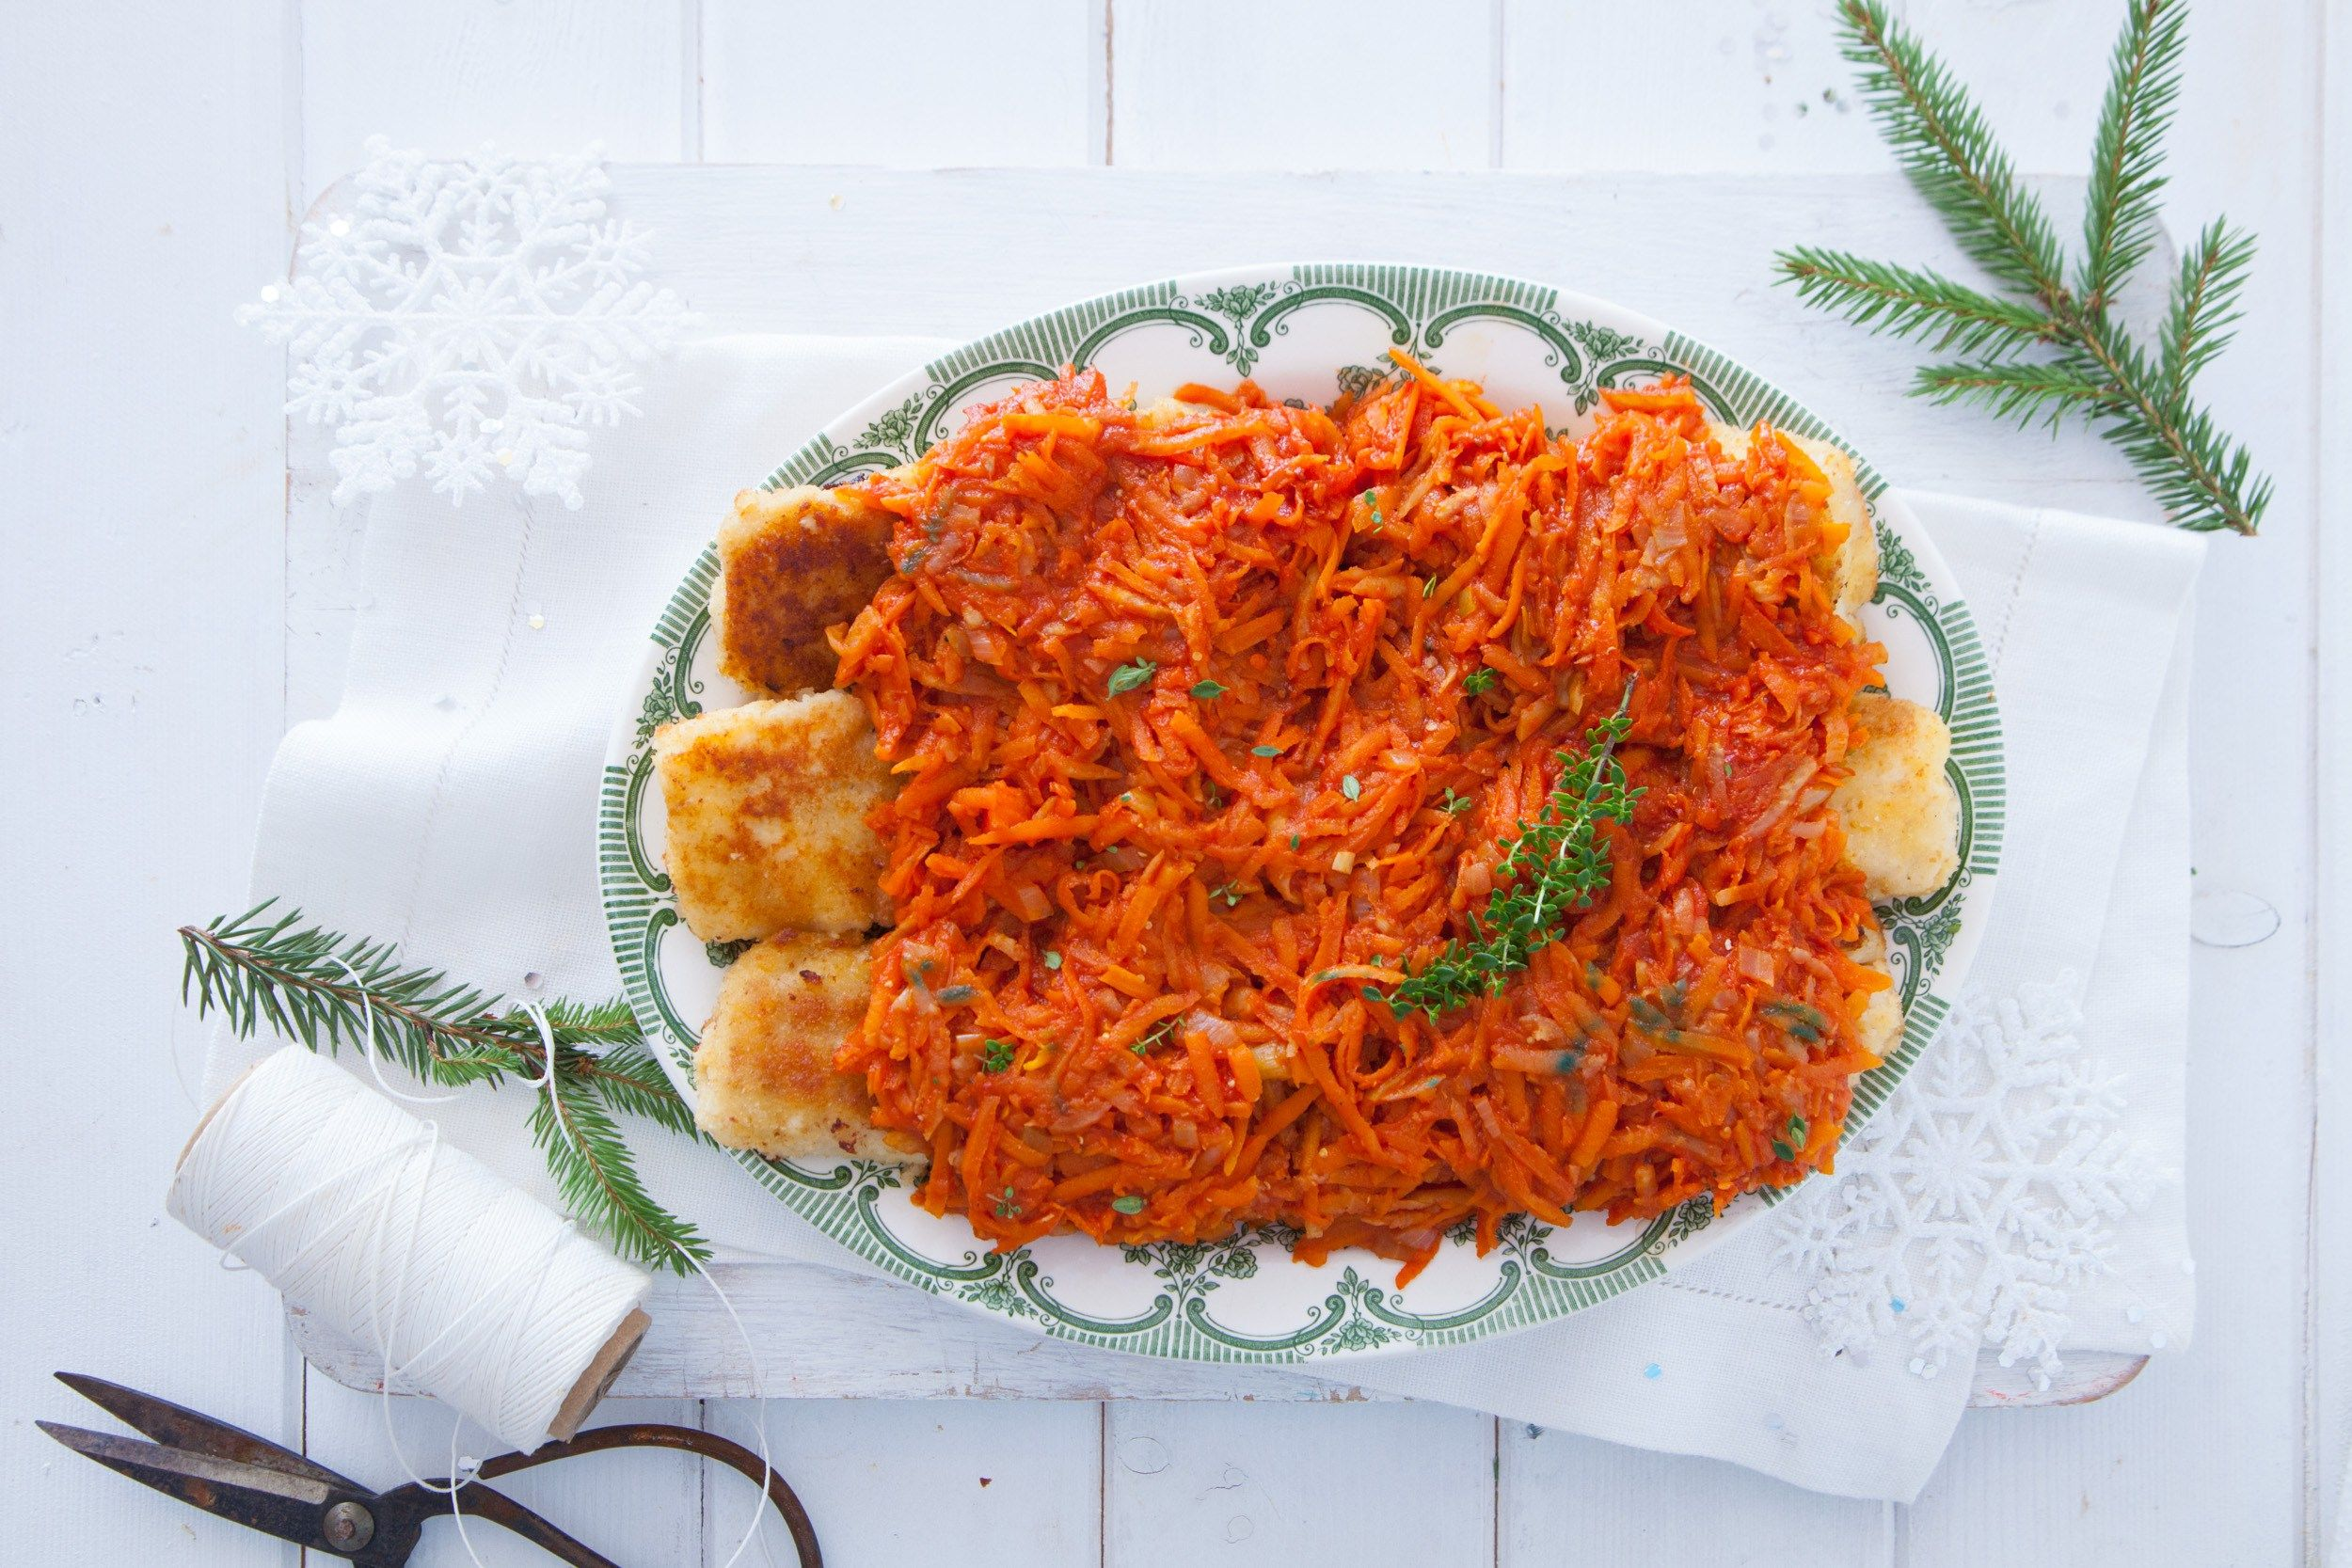 Pin On Food Of Poland Kuchnia Polska